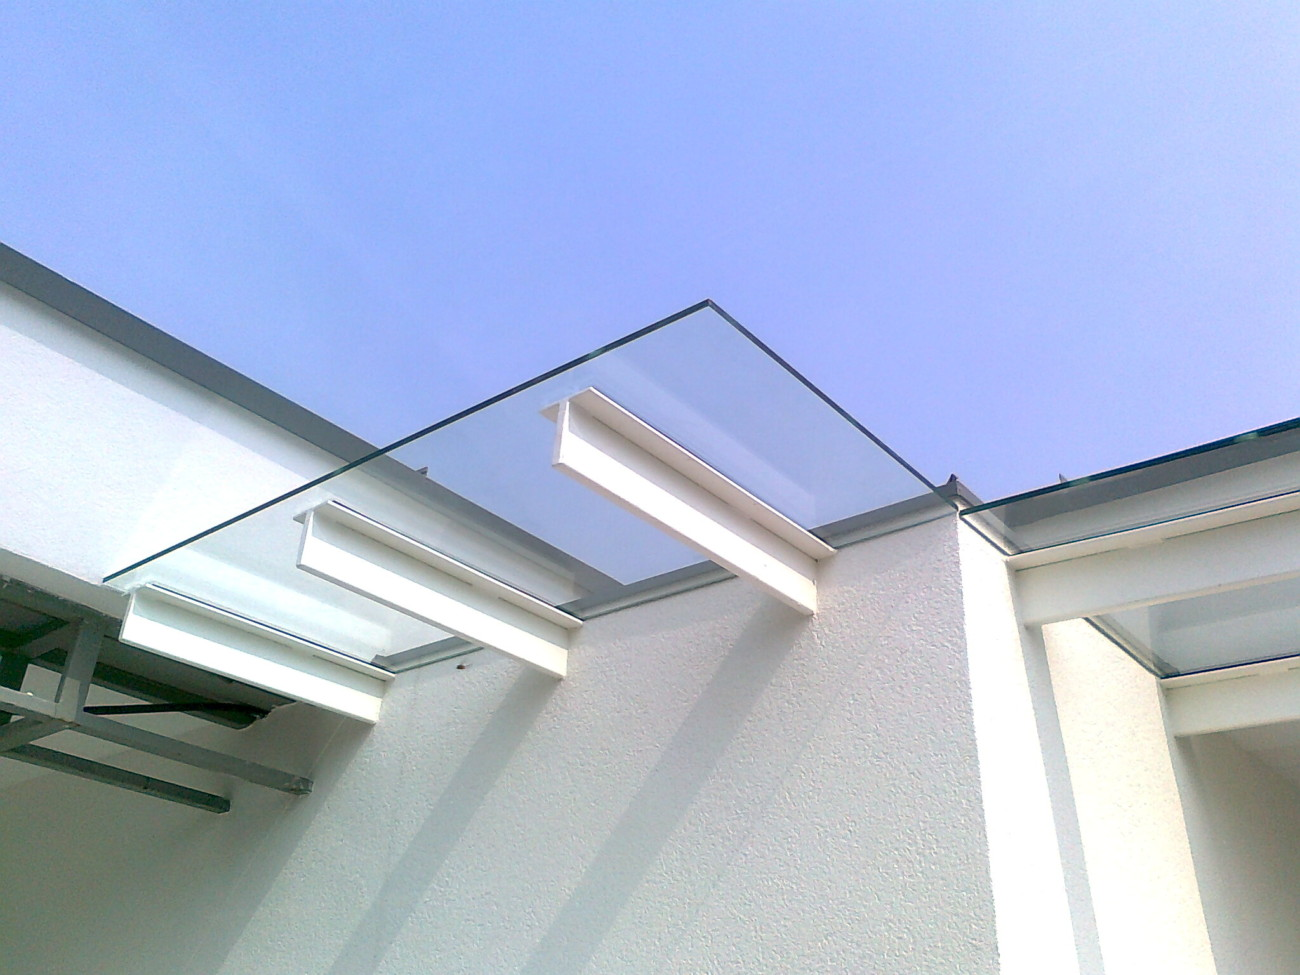 vetreria gottardi, vetreria, gottardi, pensilina, vetro, pensilina in vetro, pensilina trasparente, design, pergine, trento